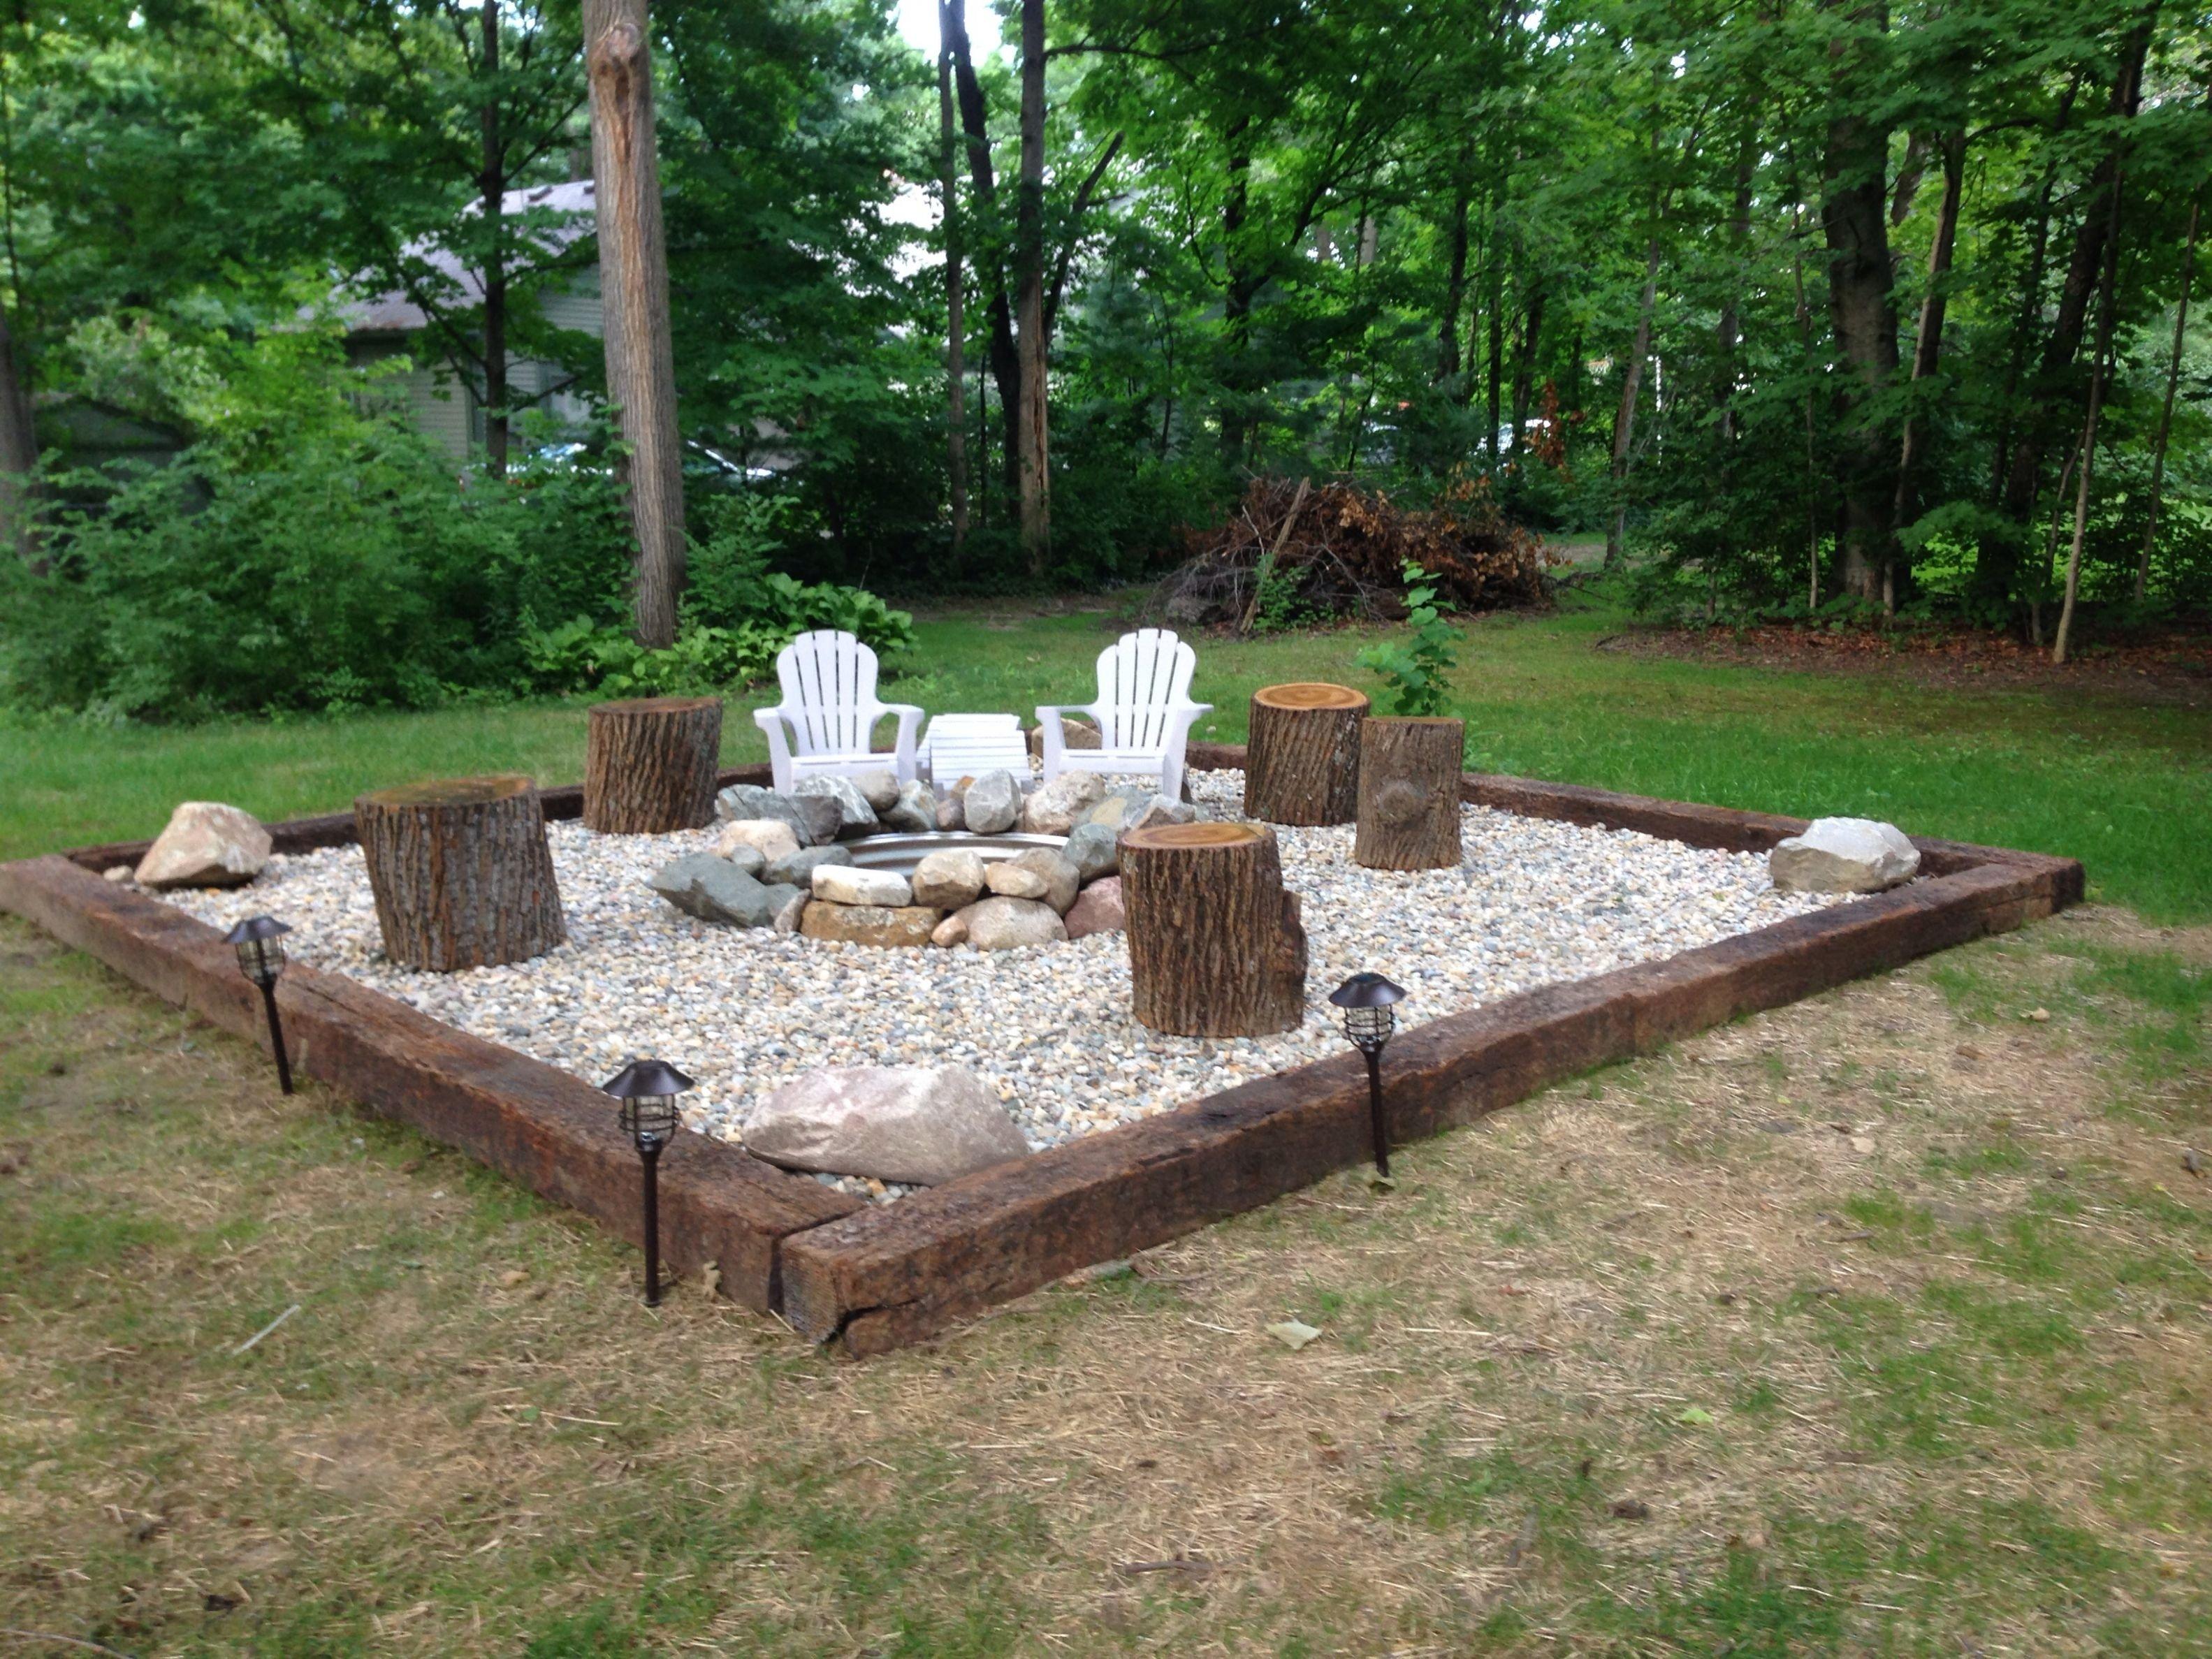 10 Great Outdoor Fire Pit Ideas Backyard 15 outstanding cinder block fire pit design ideas for outdoor fire 1 2020